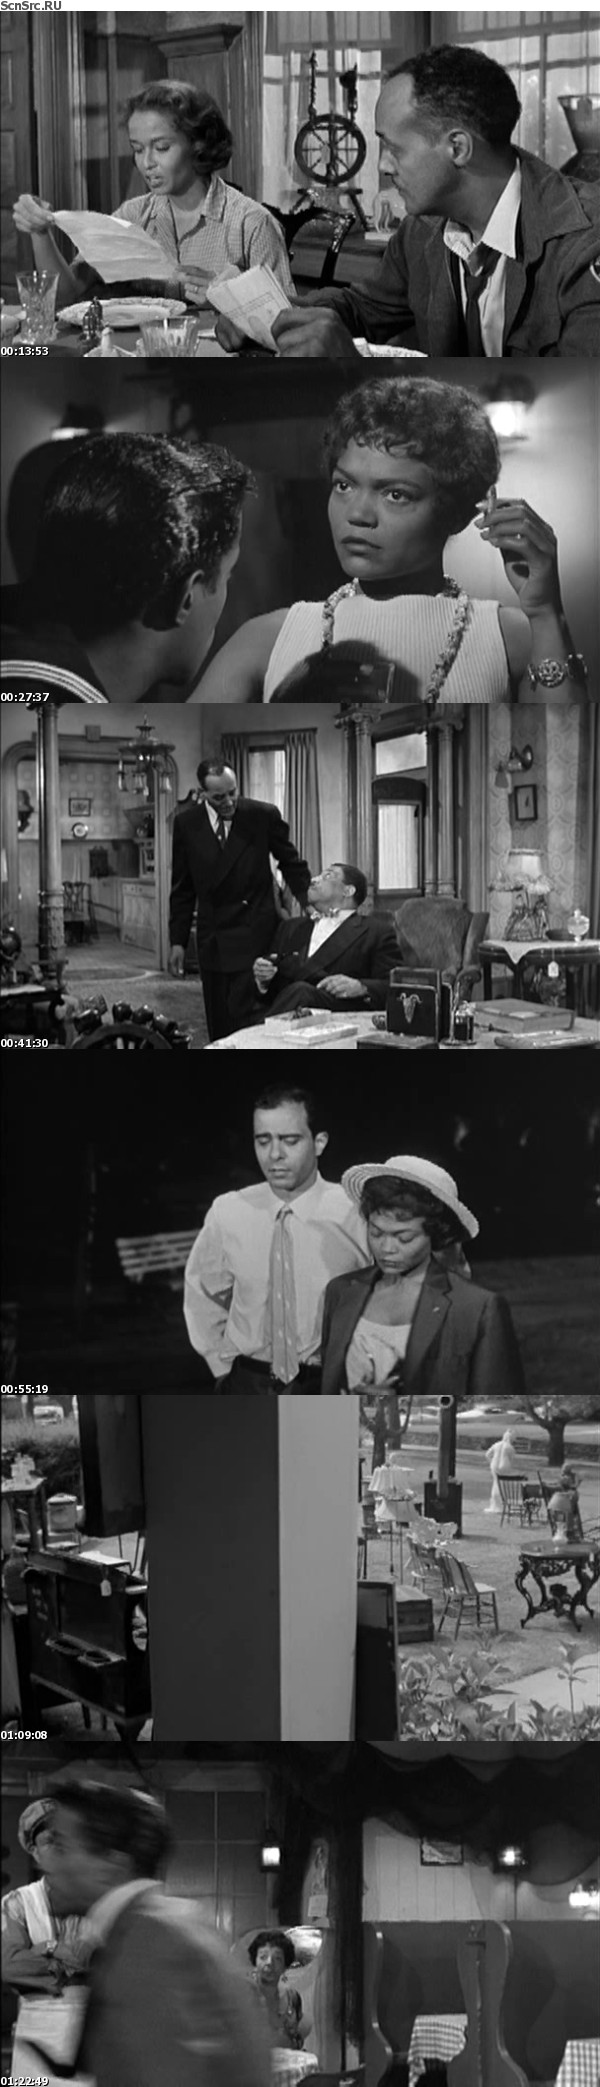 Anna Lucasta 1958 DVDRip XViD